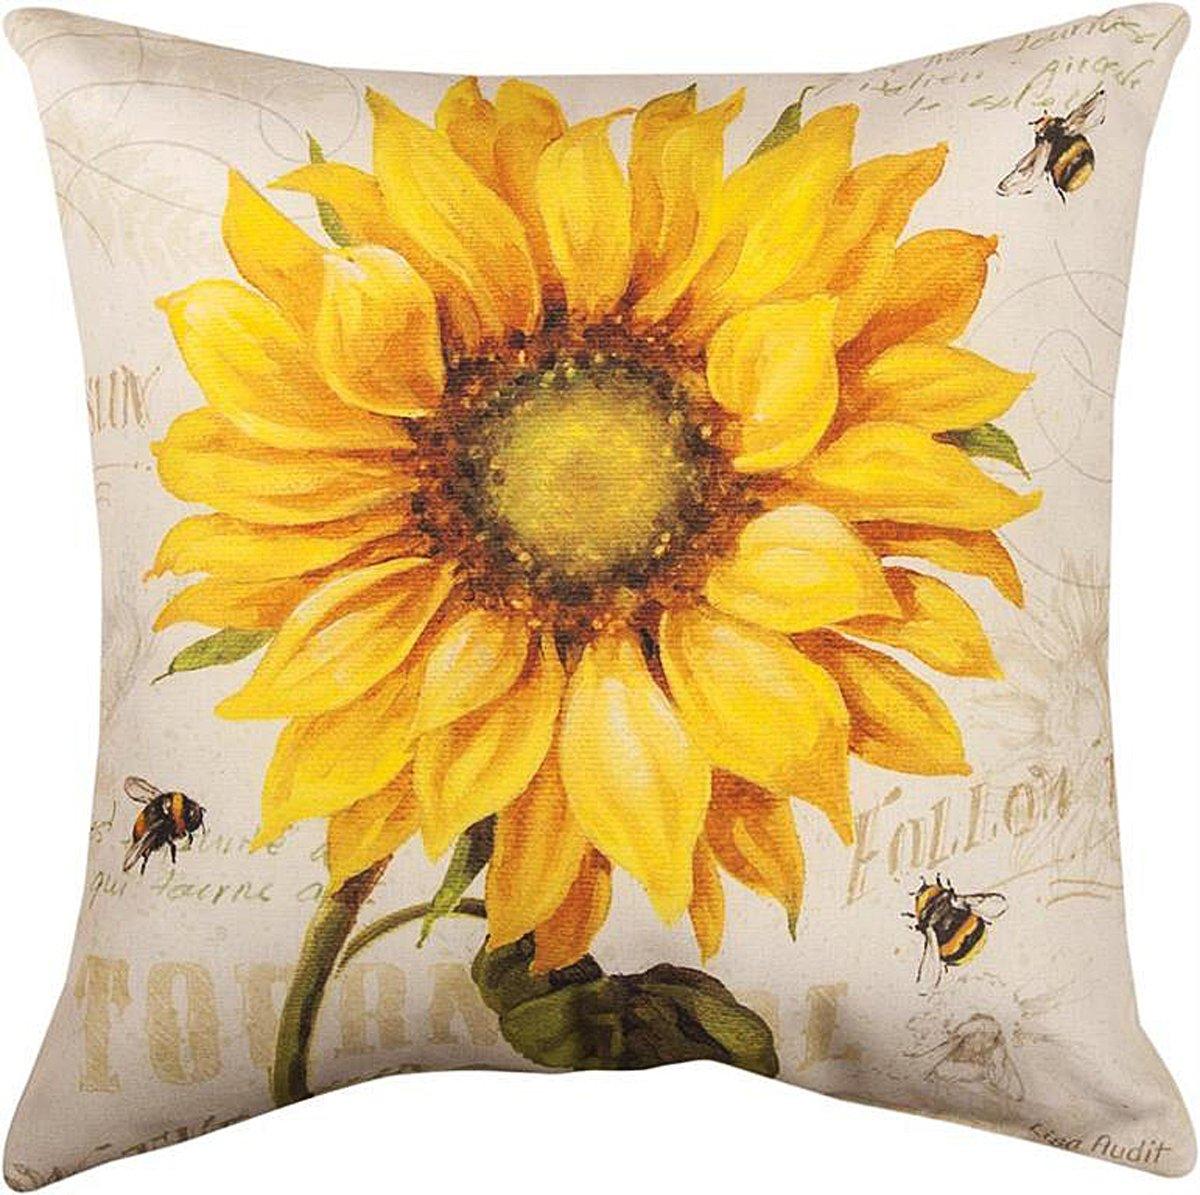 Amazon.com: Decorative Pillows - Provencal Sunflower Pillow - 17 ...